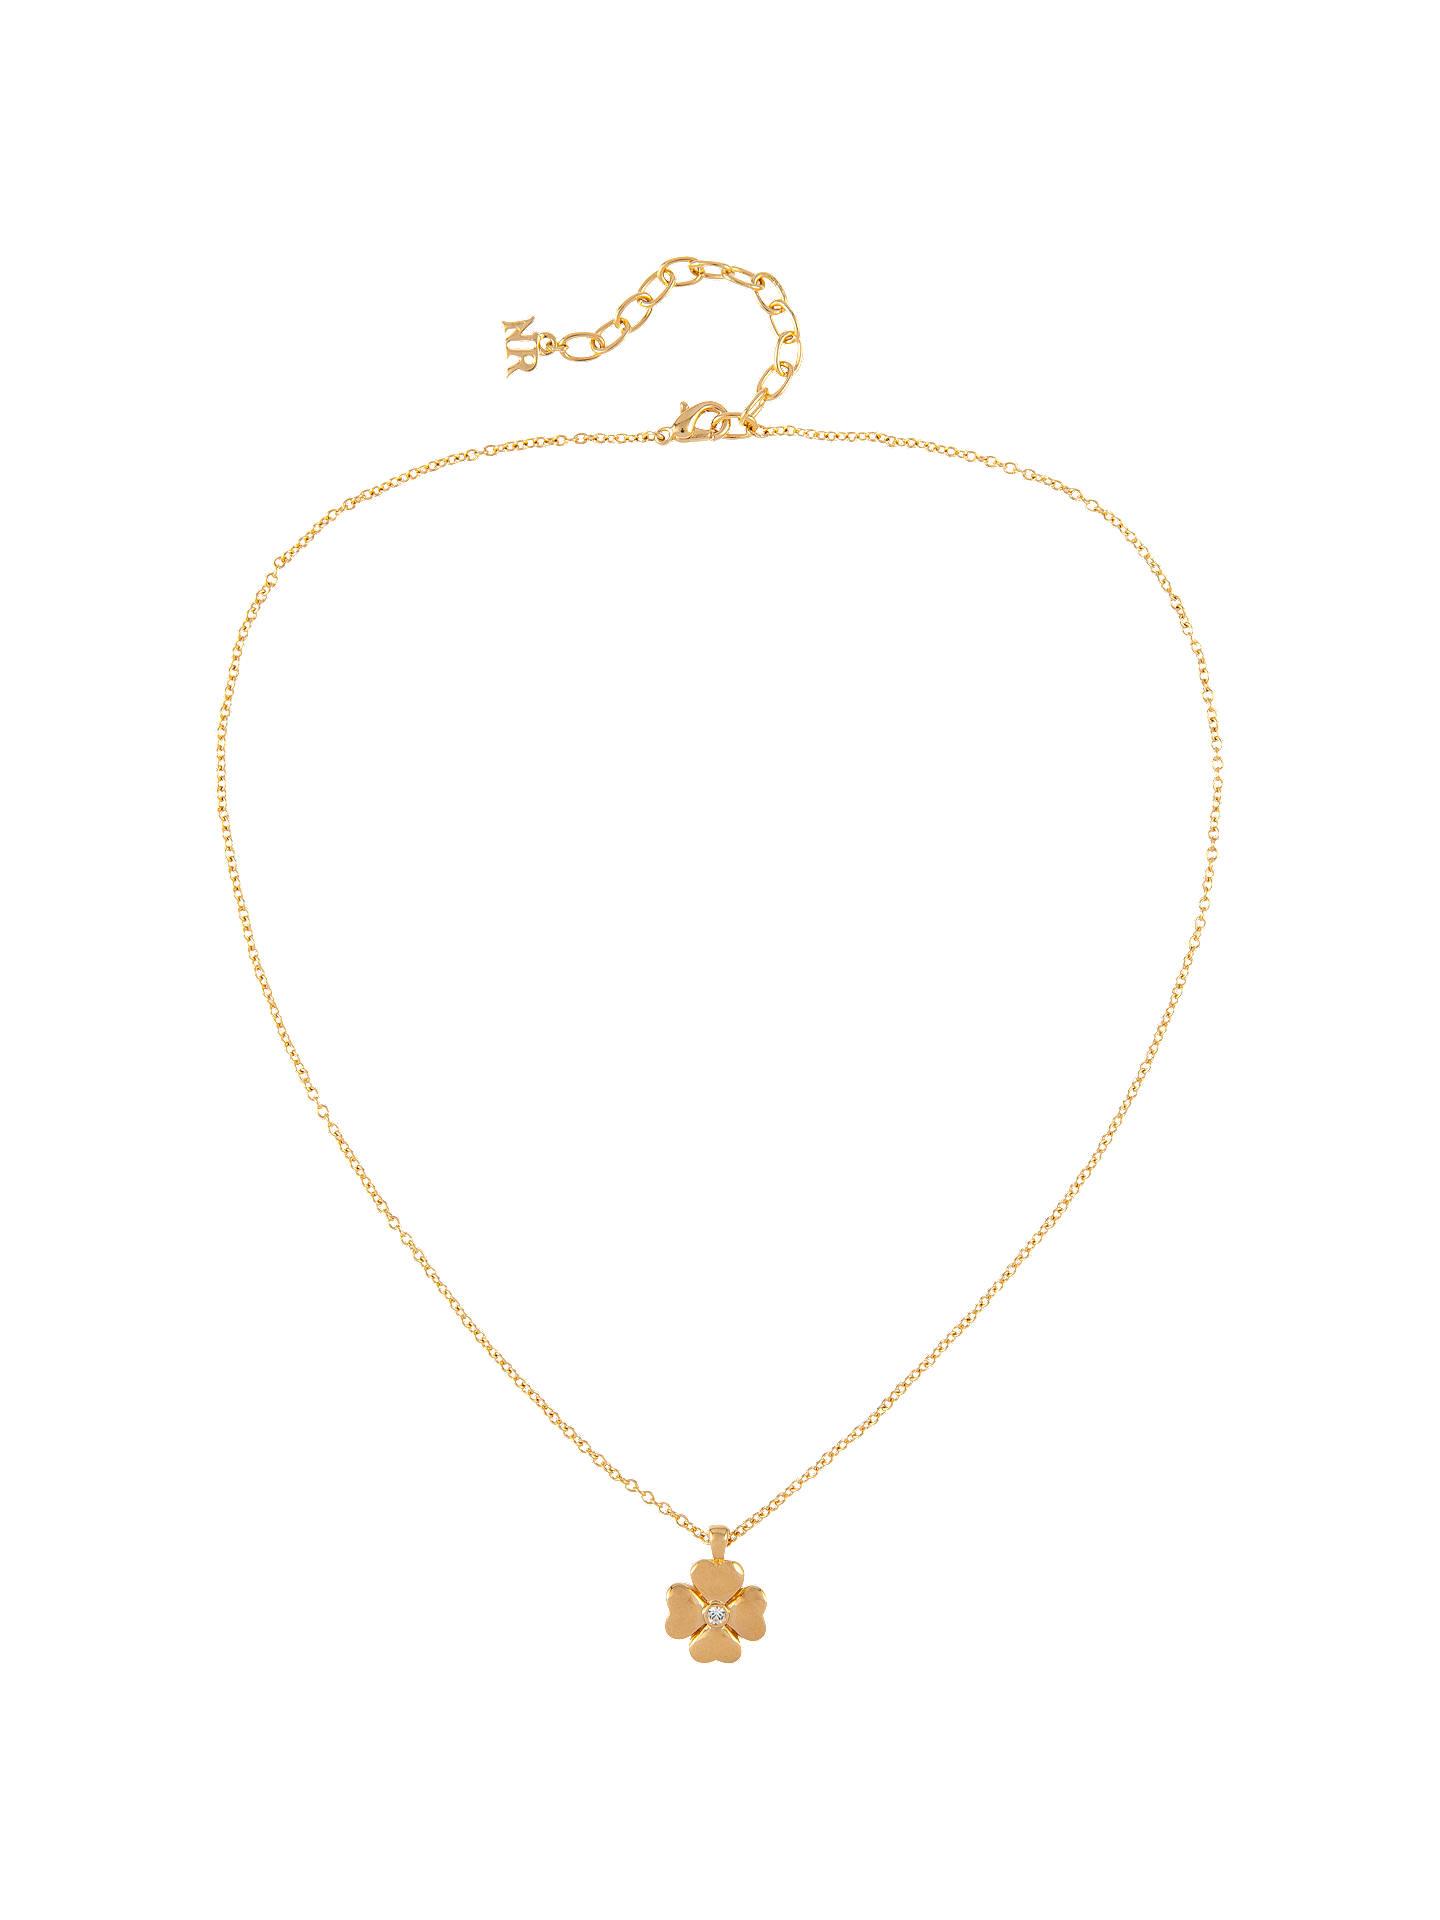 0aec9f6ceee Buy Susan Caplan Vintage 22ct Gold Plated Swarovski Crystal Four Leaf  Clover Pendant Necklace, Gold ...